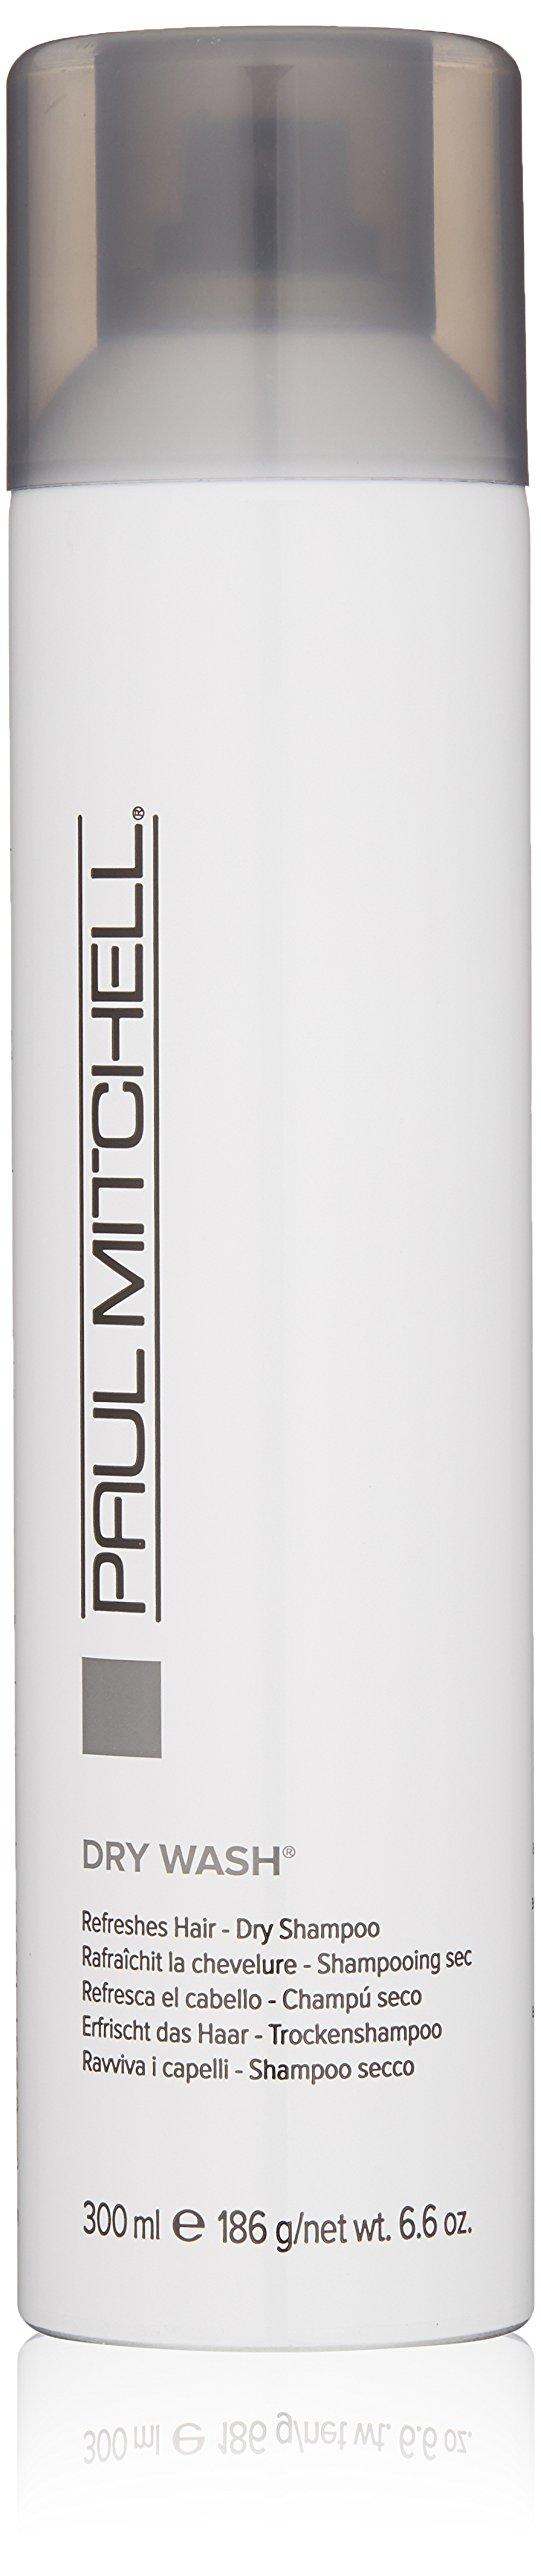 Paul Mitchell Dry Wash Shampoo,6.6 oz